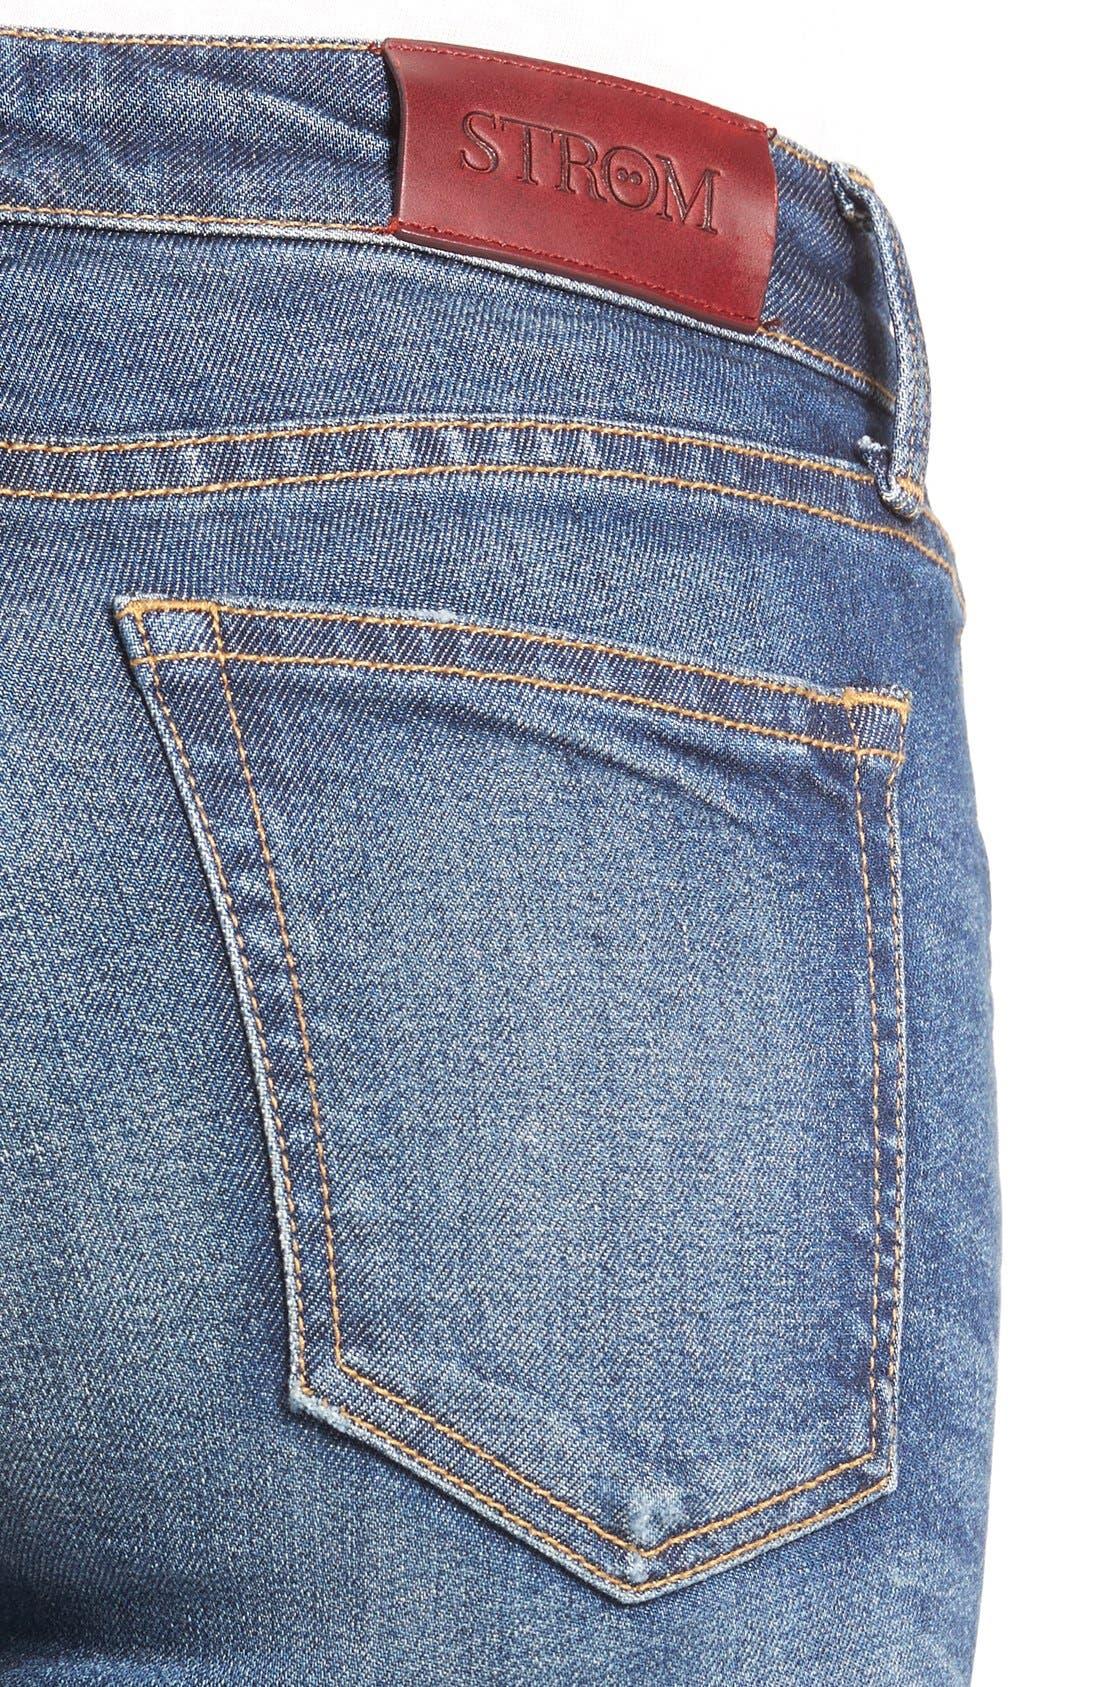 STROM,                             'Tio' Ankle Skinny Jeans,                             Alternate thumbnail 4, color,                             420